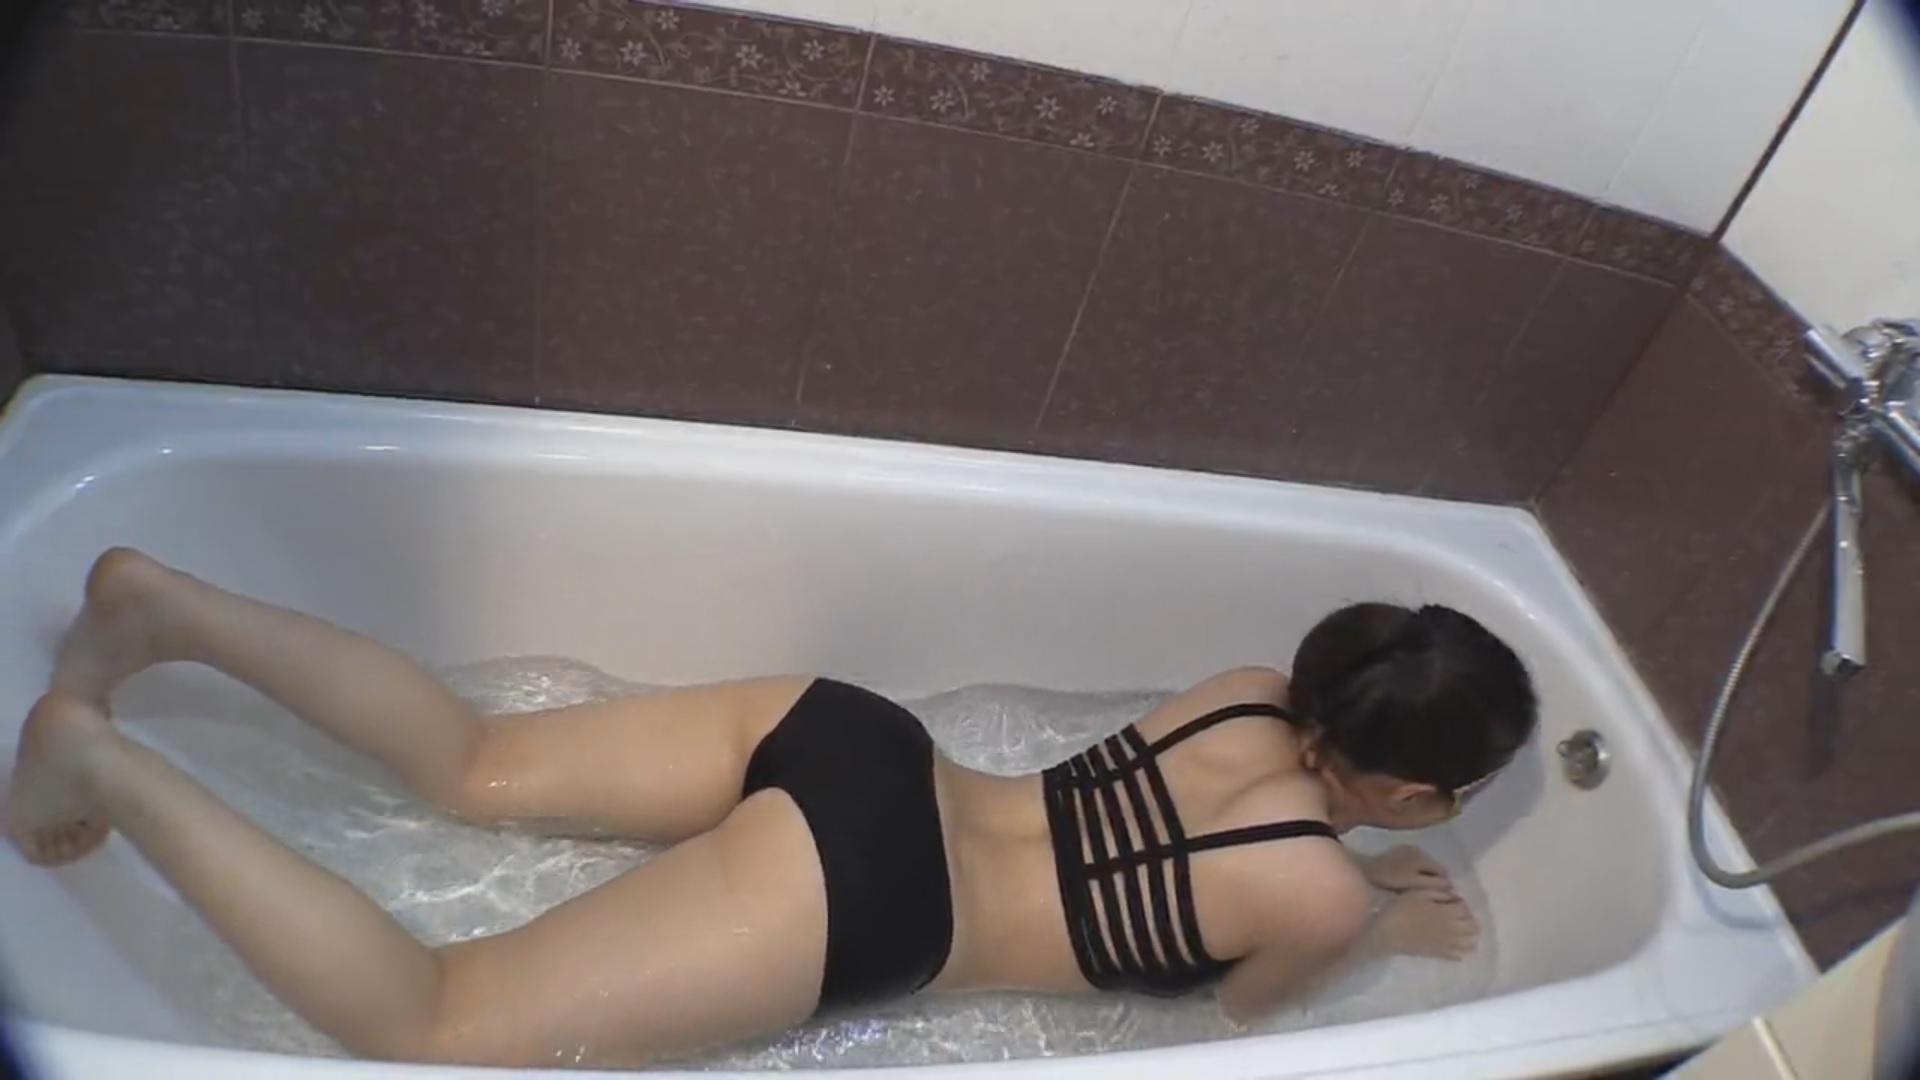 Mia19 - Princess Mia and toilet slave - Princess Mia Scat Smearing - Bathroom scat